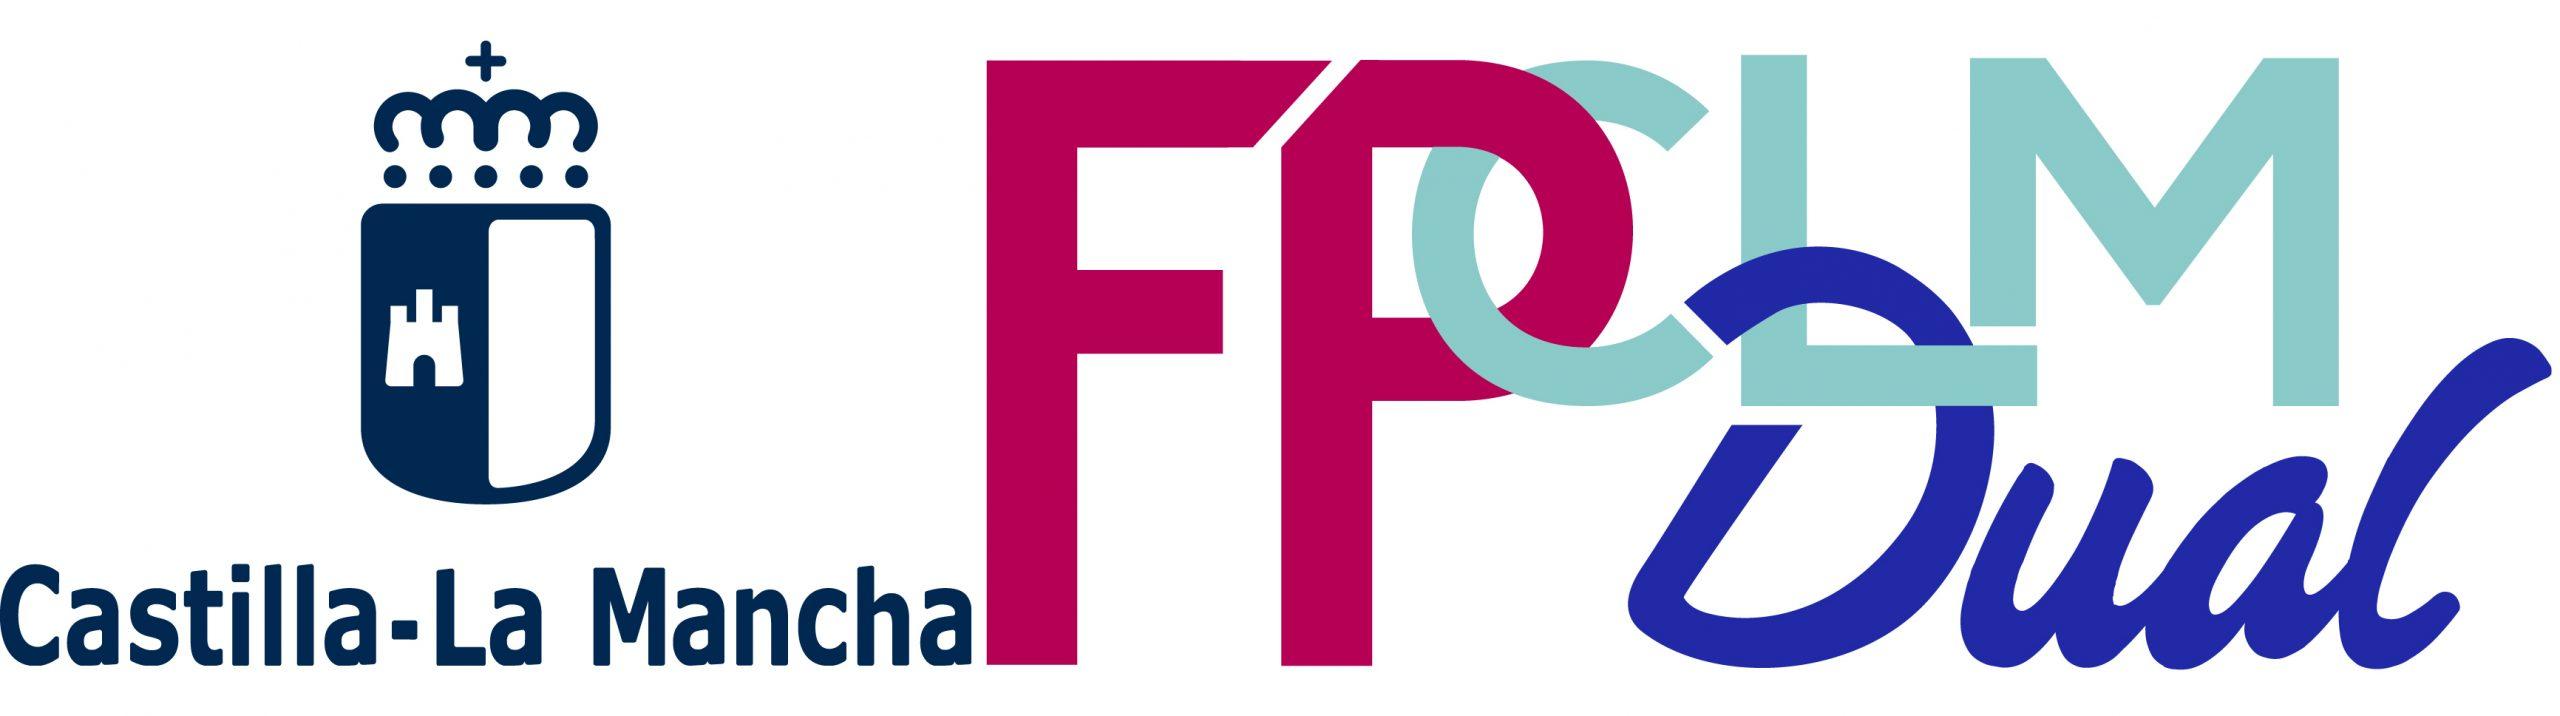 Logo_CLMFPDual_Completo (002)